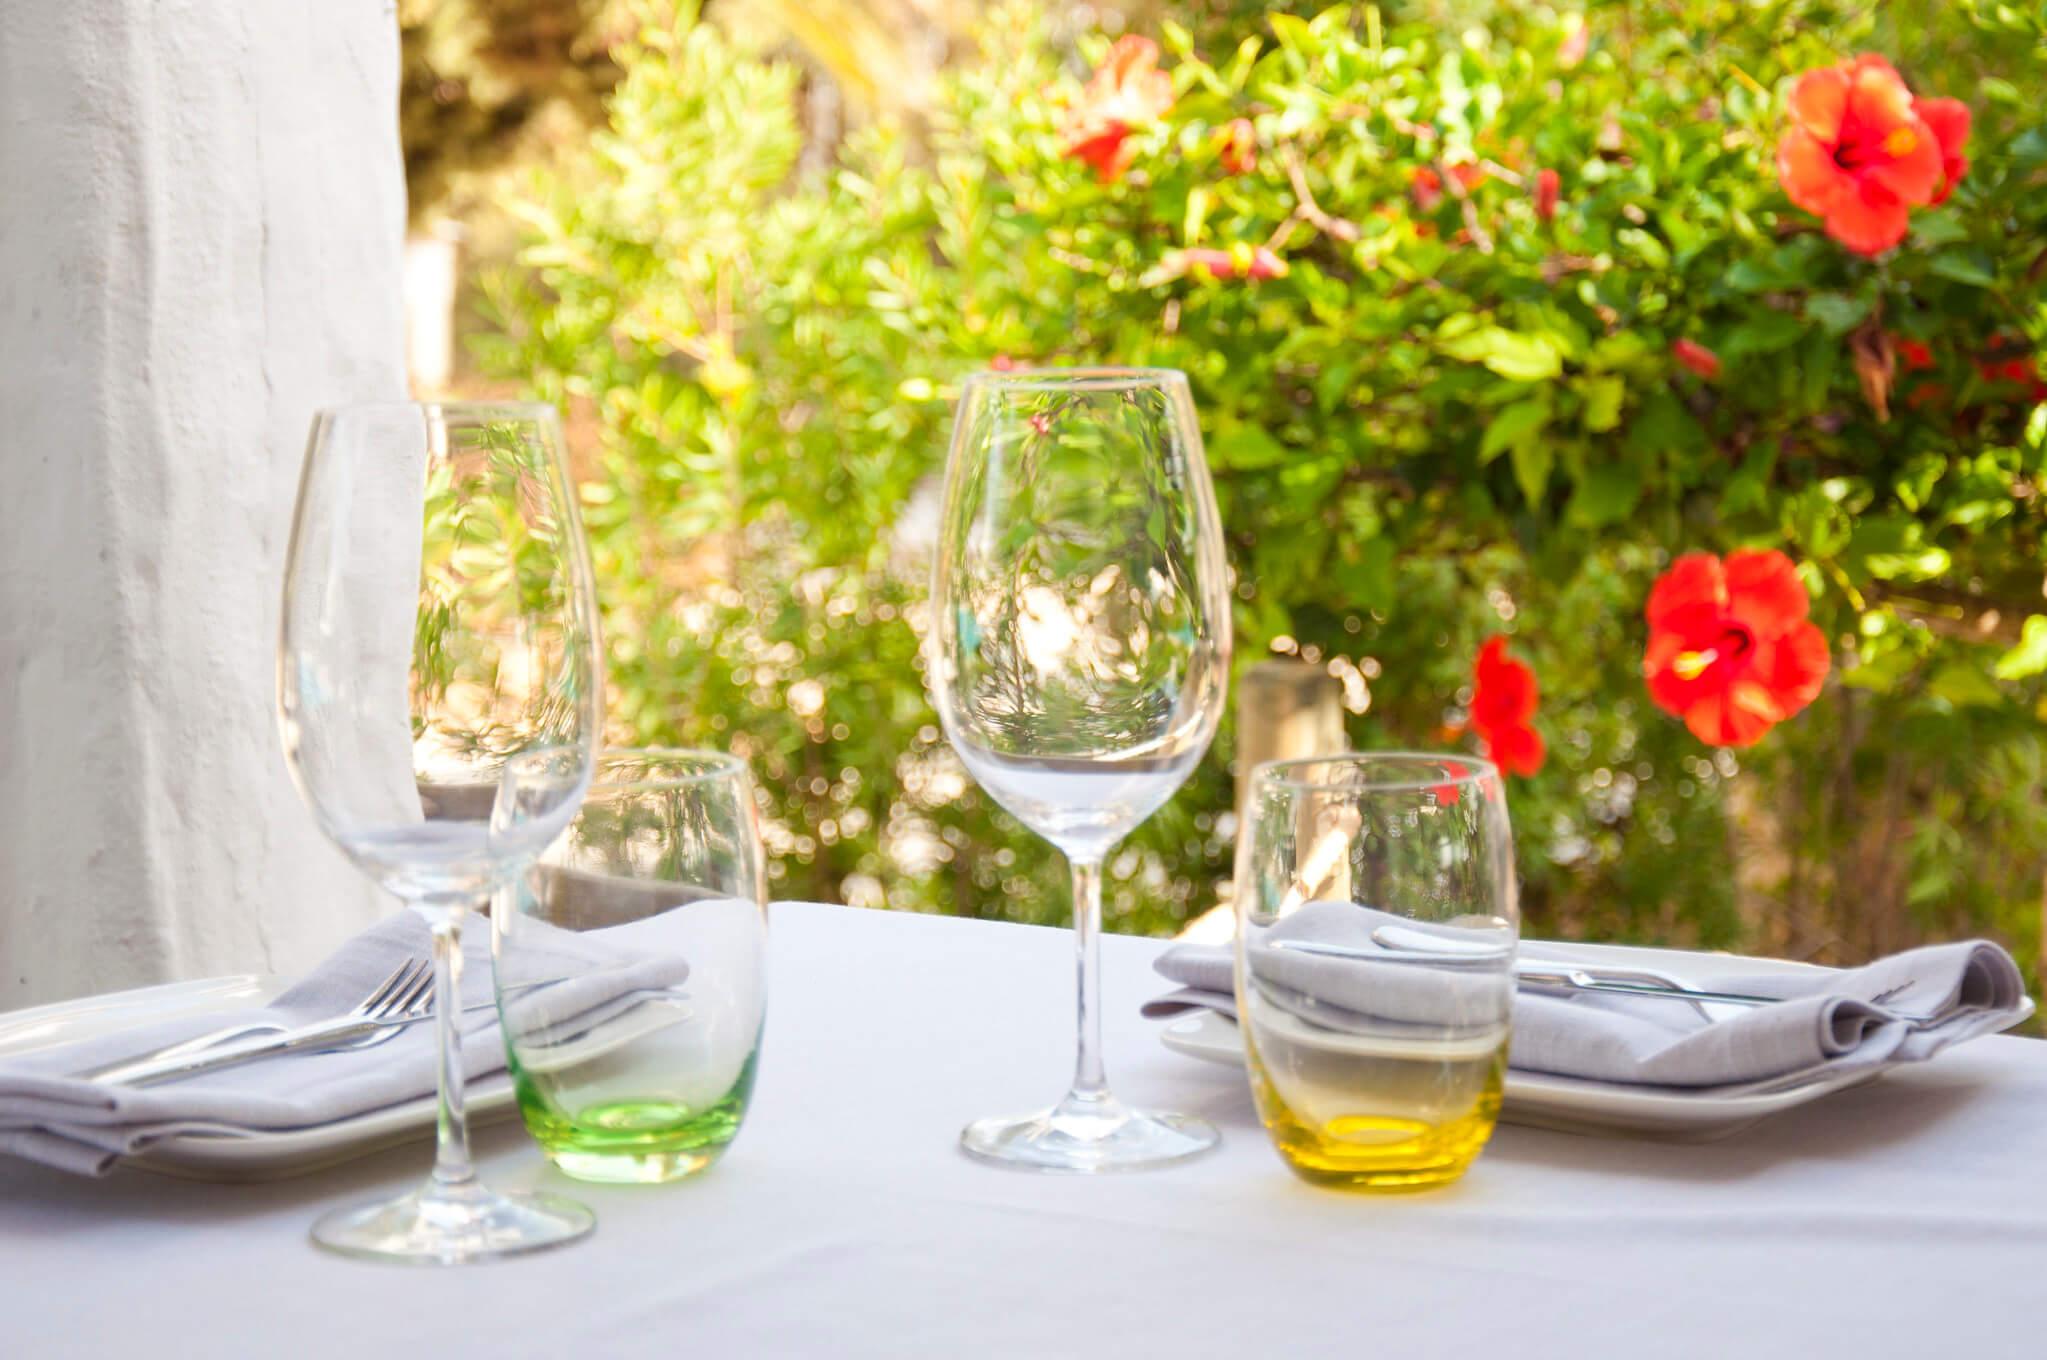 https://www.white-ibiza.com/wp-content/uploads/2020/03/formentera-restaurants-marlaca-2020-02.jpg